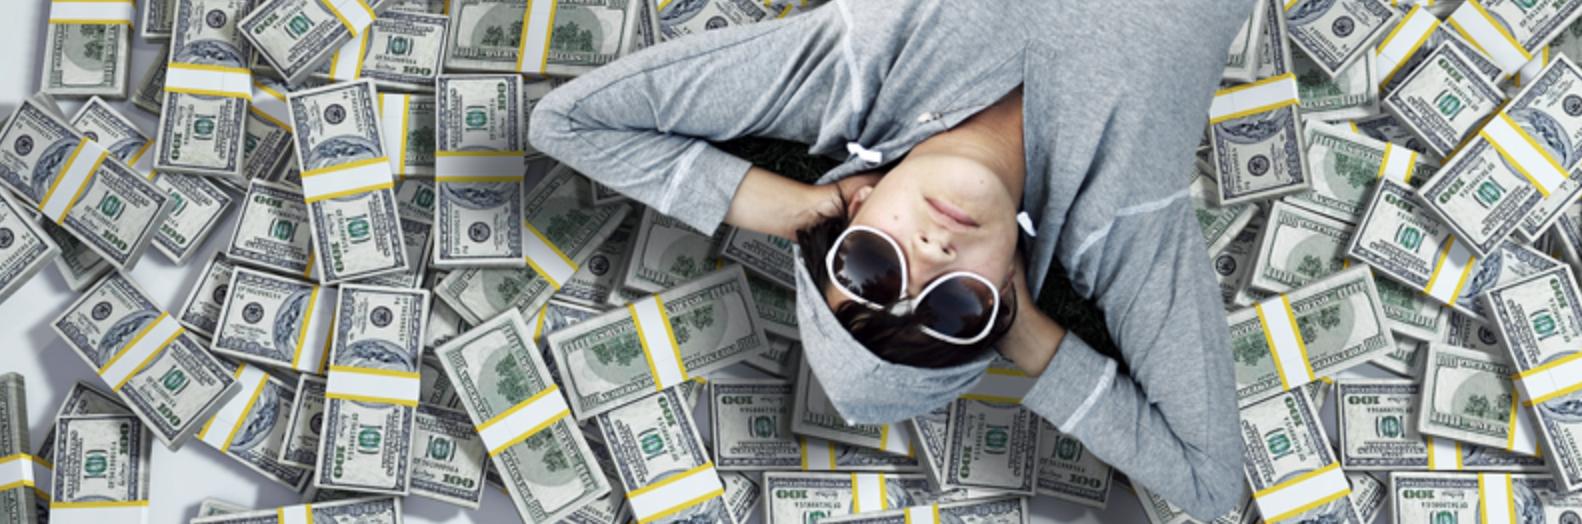 Passive Income is guaranteed to improve your sleep